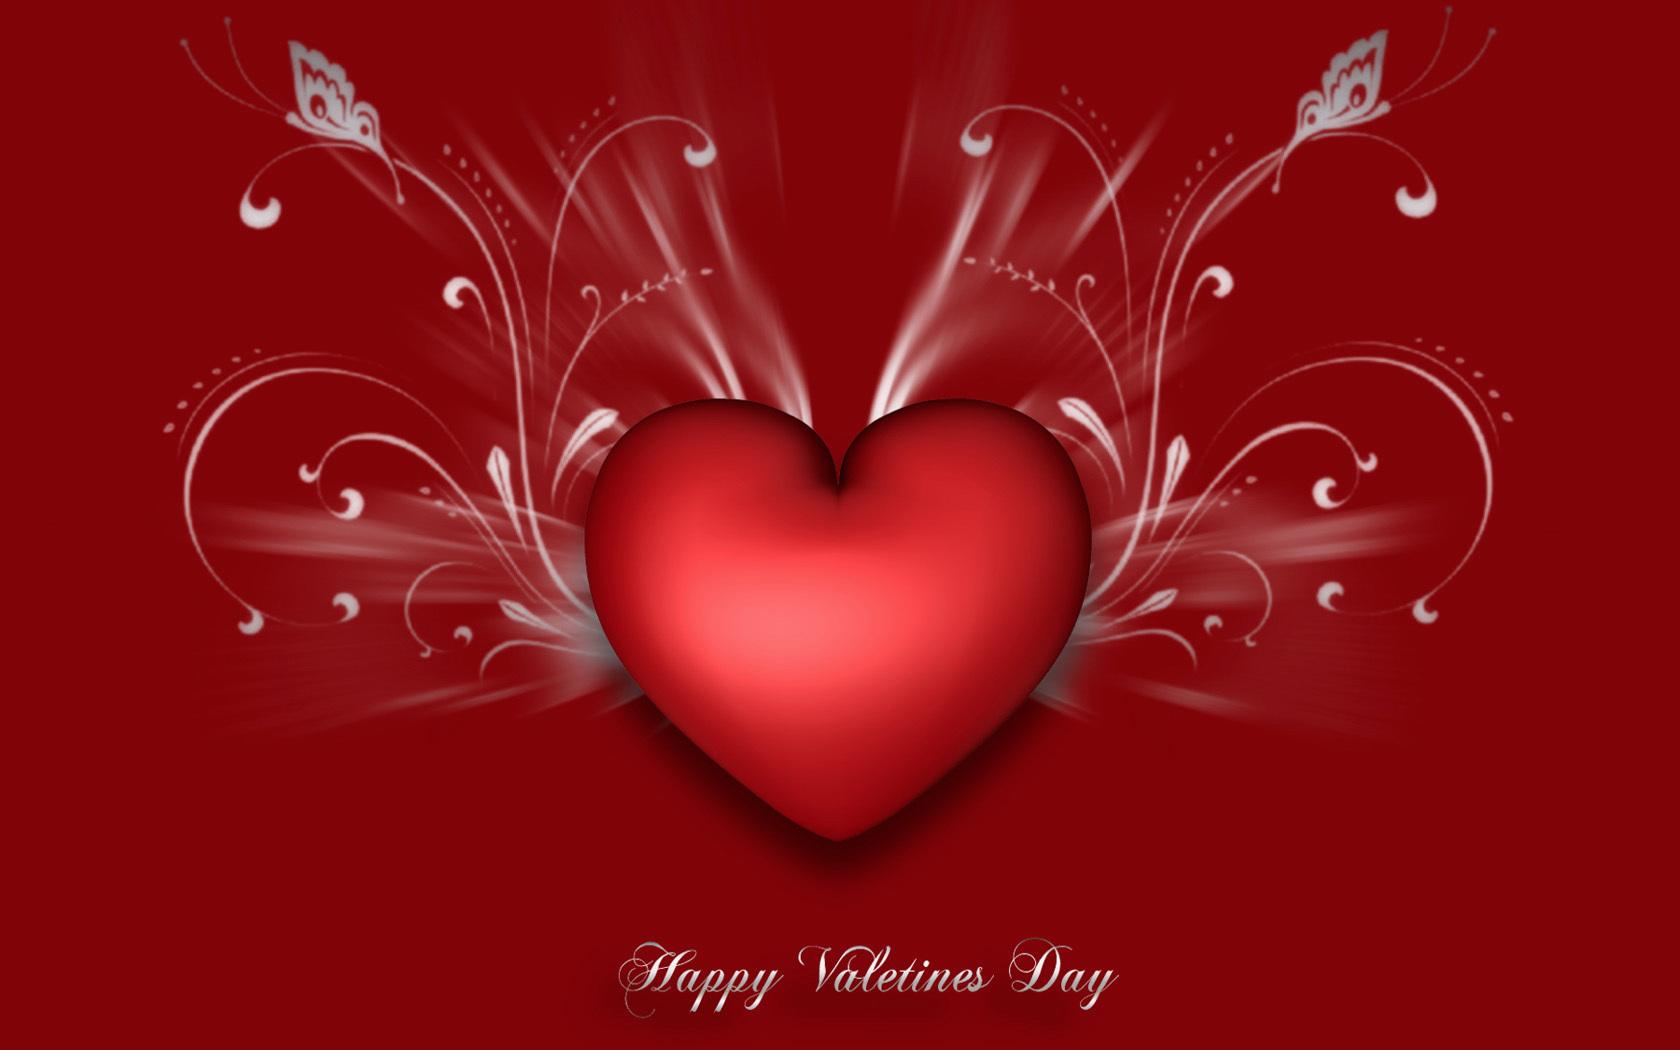 google-images-valentine-wallpaper-free_4941377.jpg